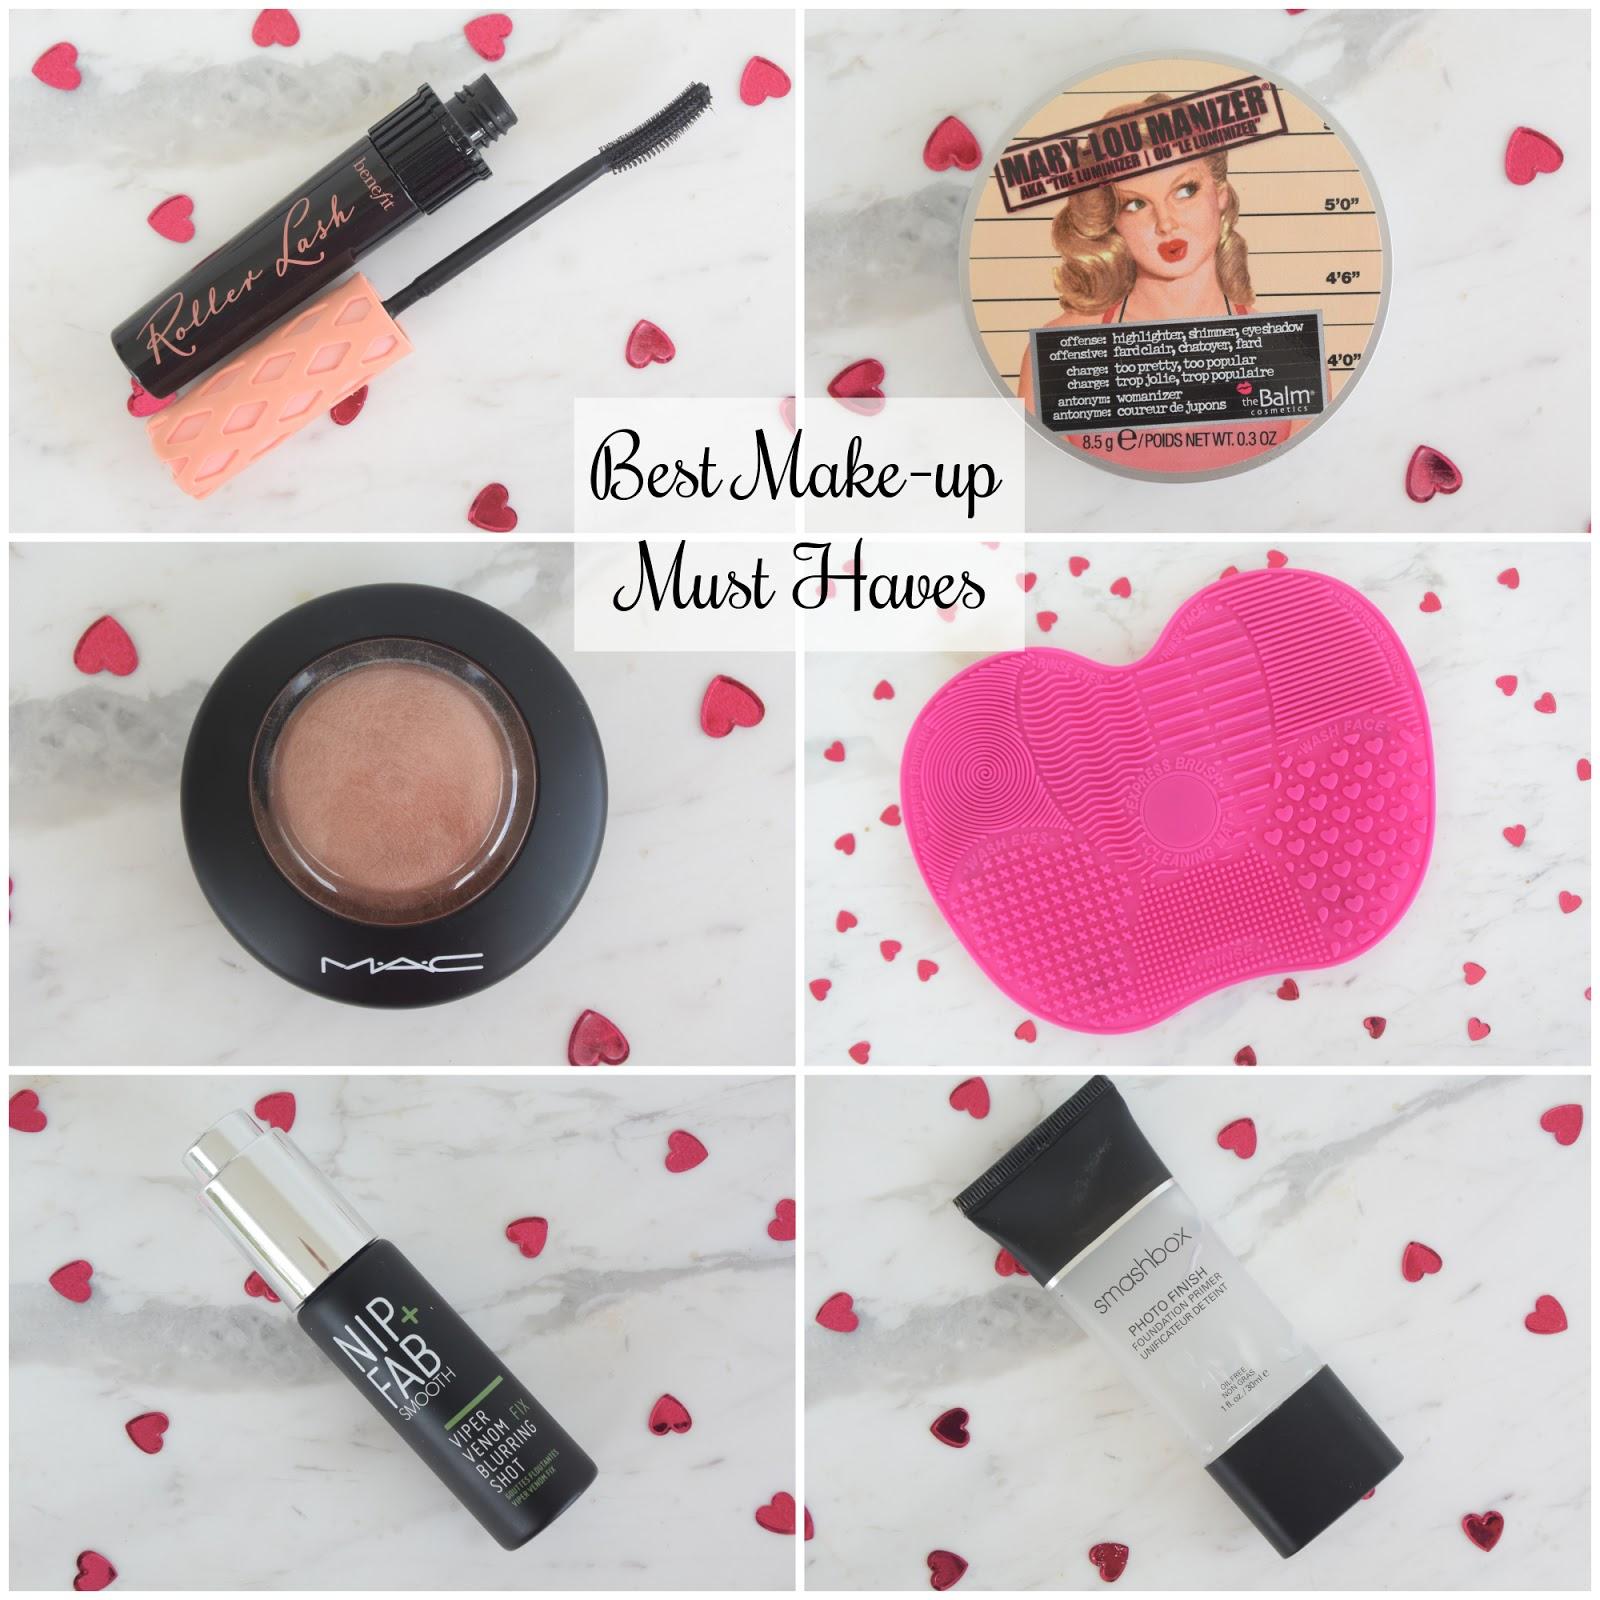 7a8cb0a0829 Beauty Maniac - Εδώ μιλάμε για ομορφιά!: 10 Must-Have Προϊοντα ...